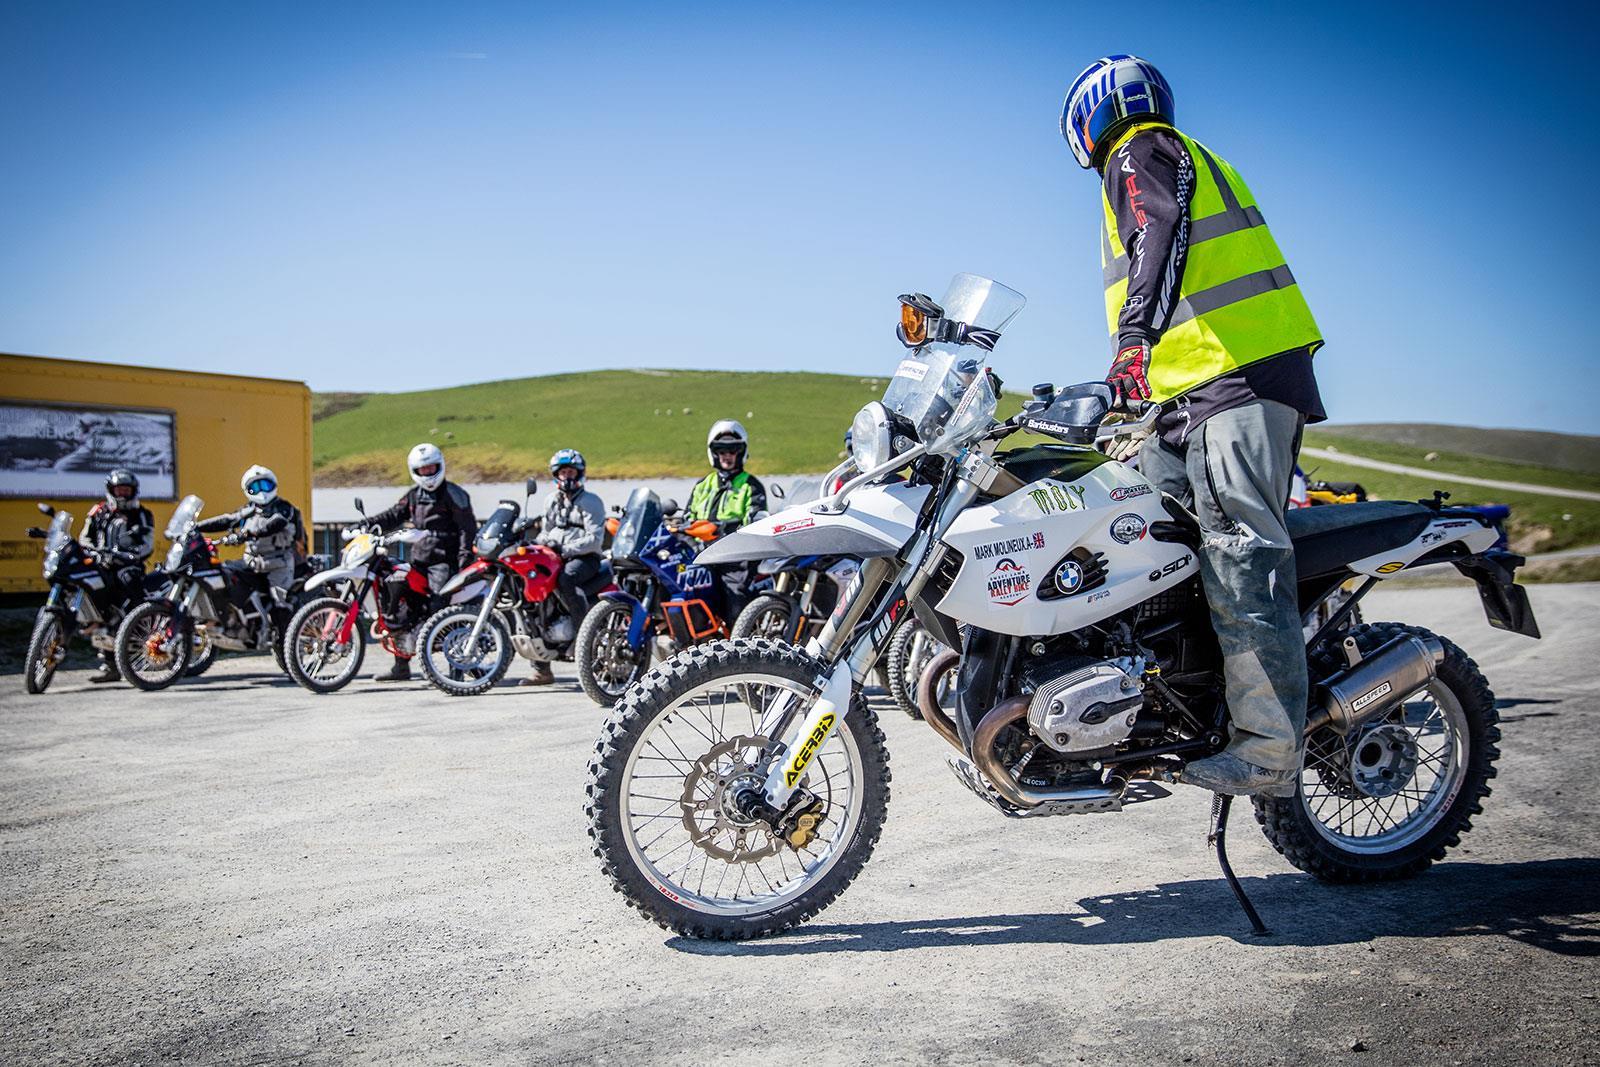 Off-road motorcycle school